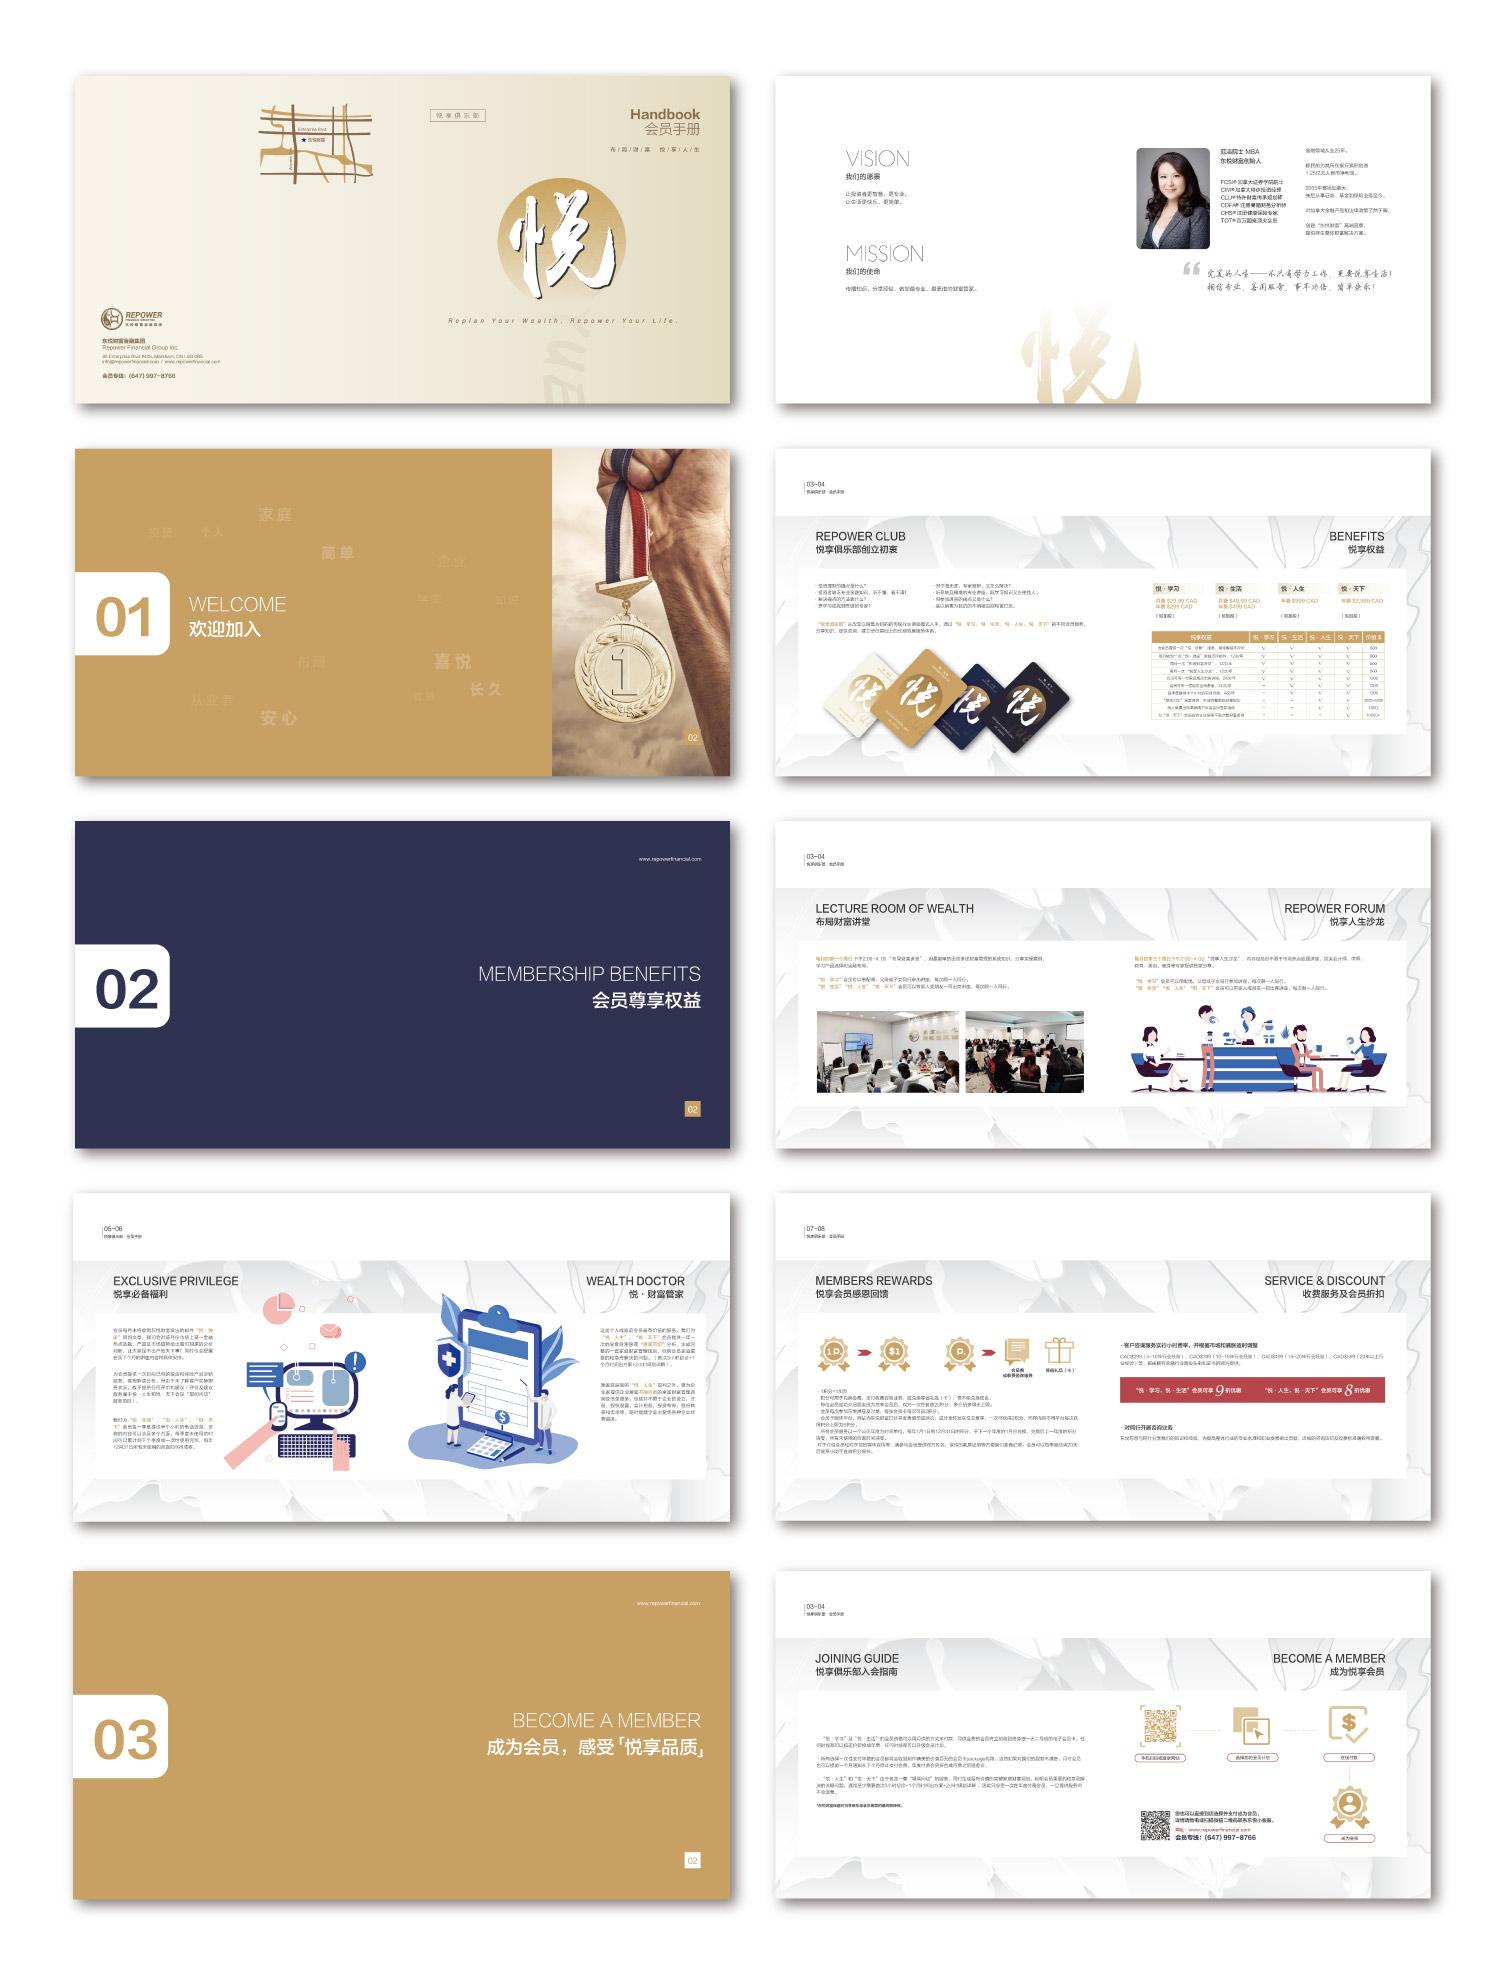 ATME - Repower financial membership brochure